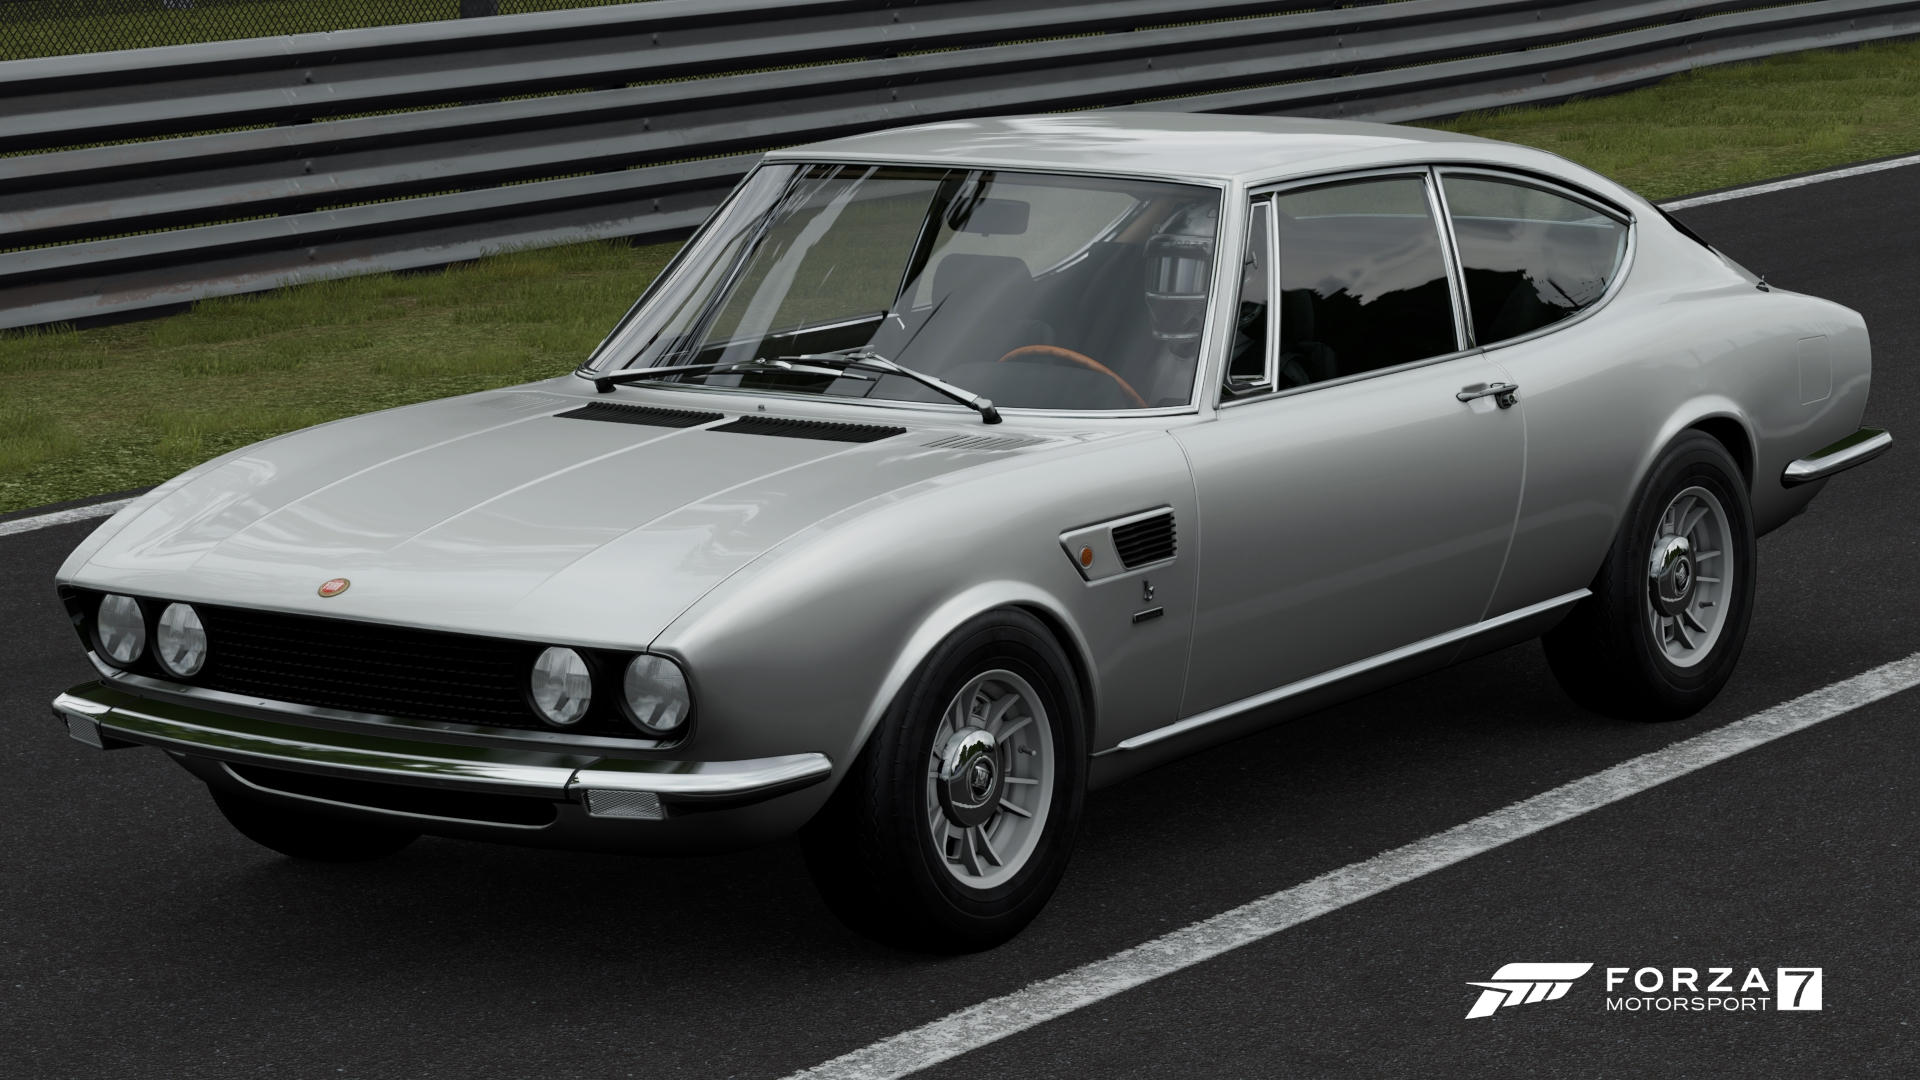 Fiat Dino 2 4 Coup 233 Forza Motorsport Wiki Fandom